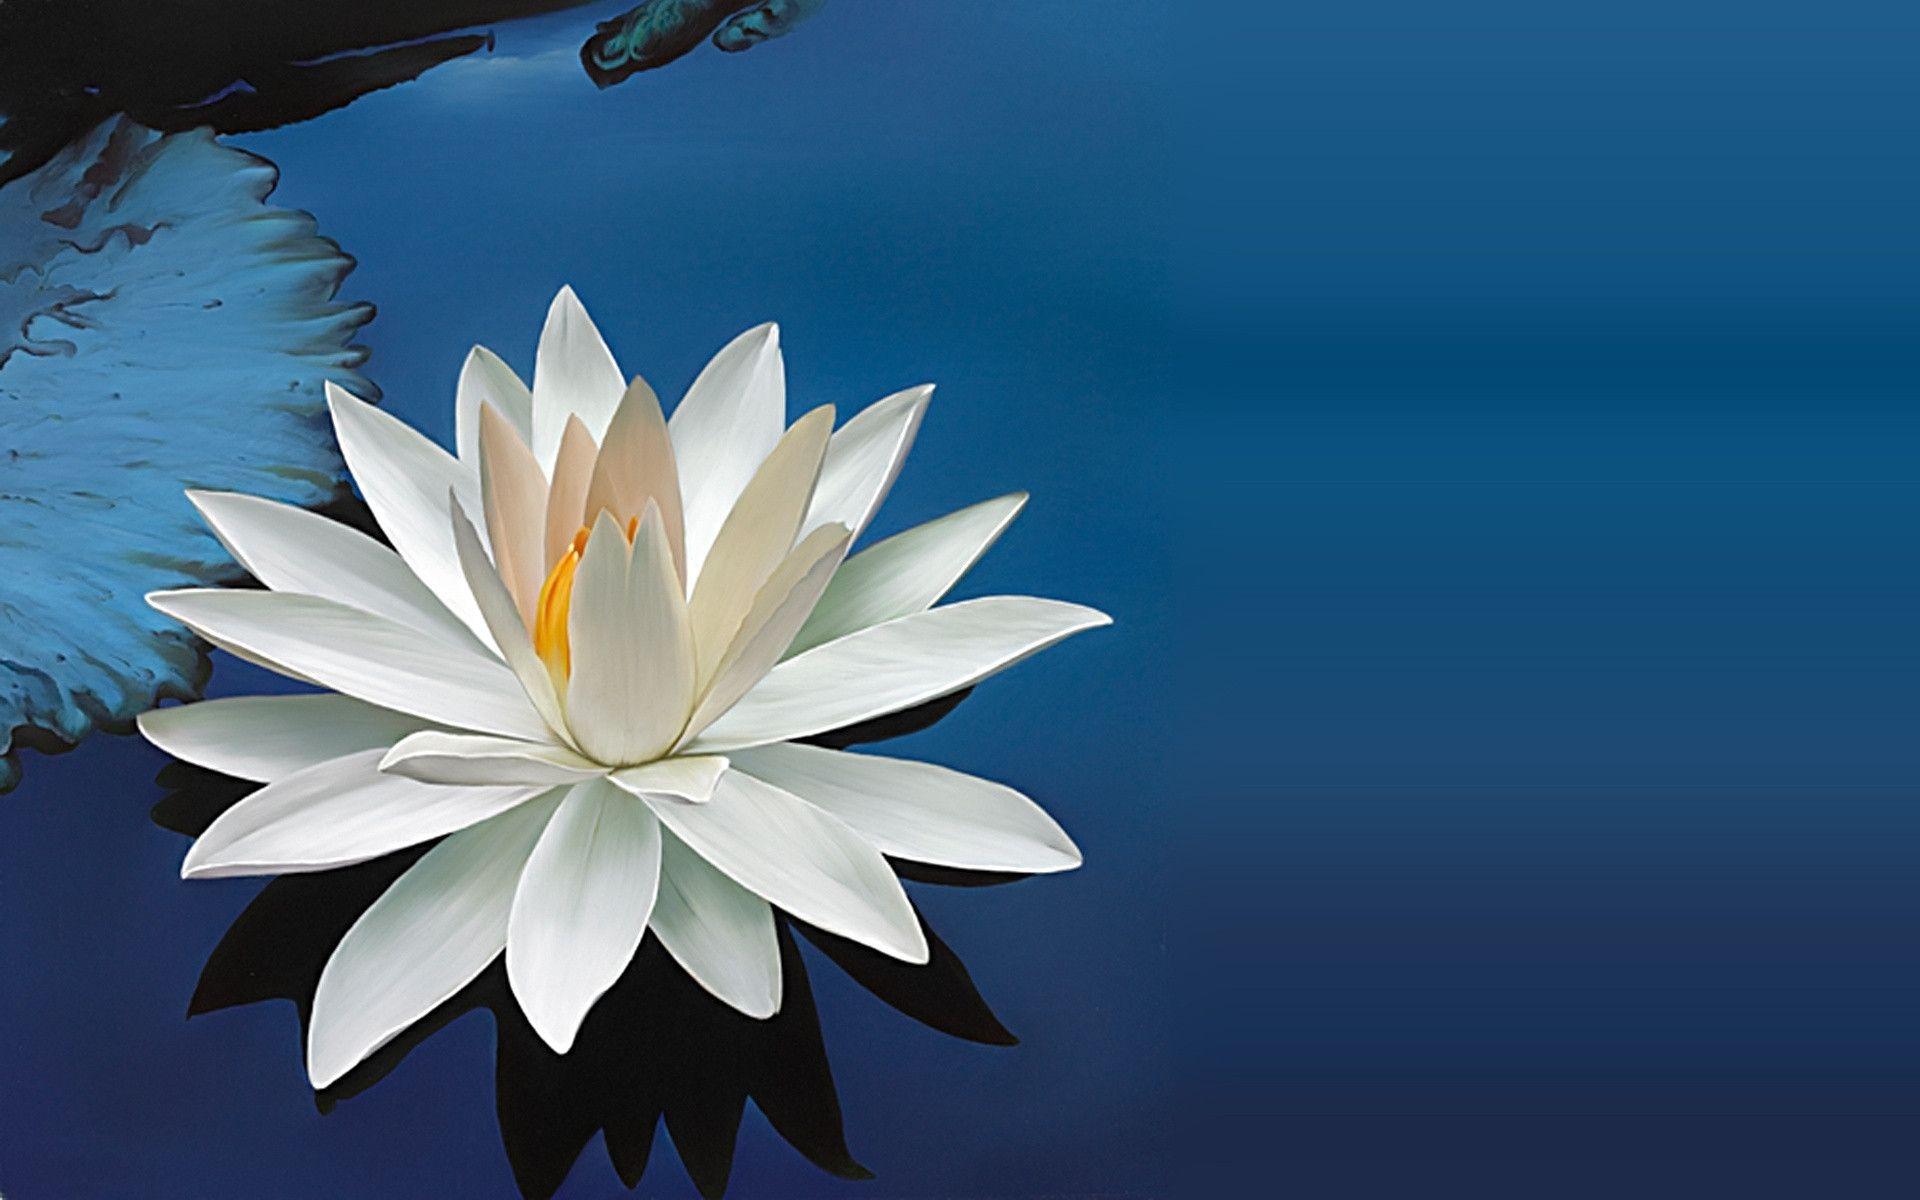 Water Lilies Wallpaper, 100% Quality Water Lilies HD Pics #TL972.